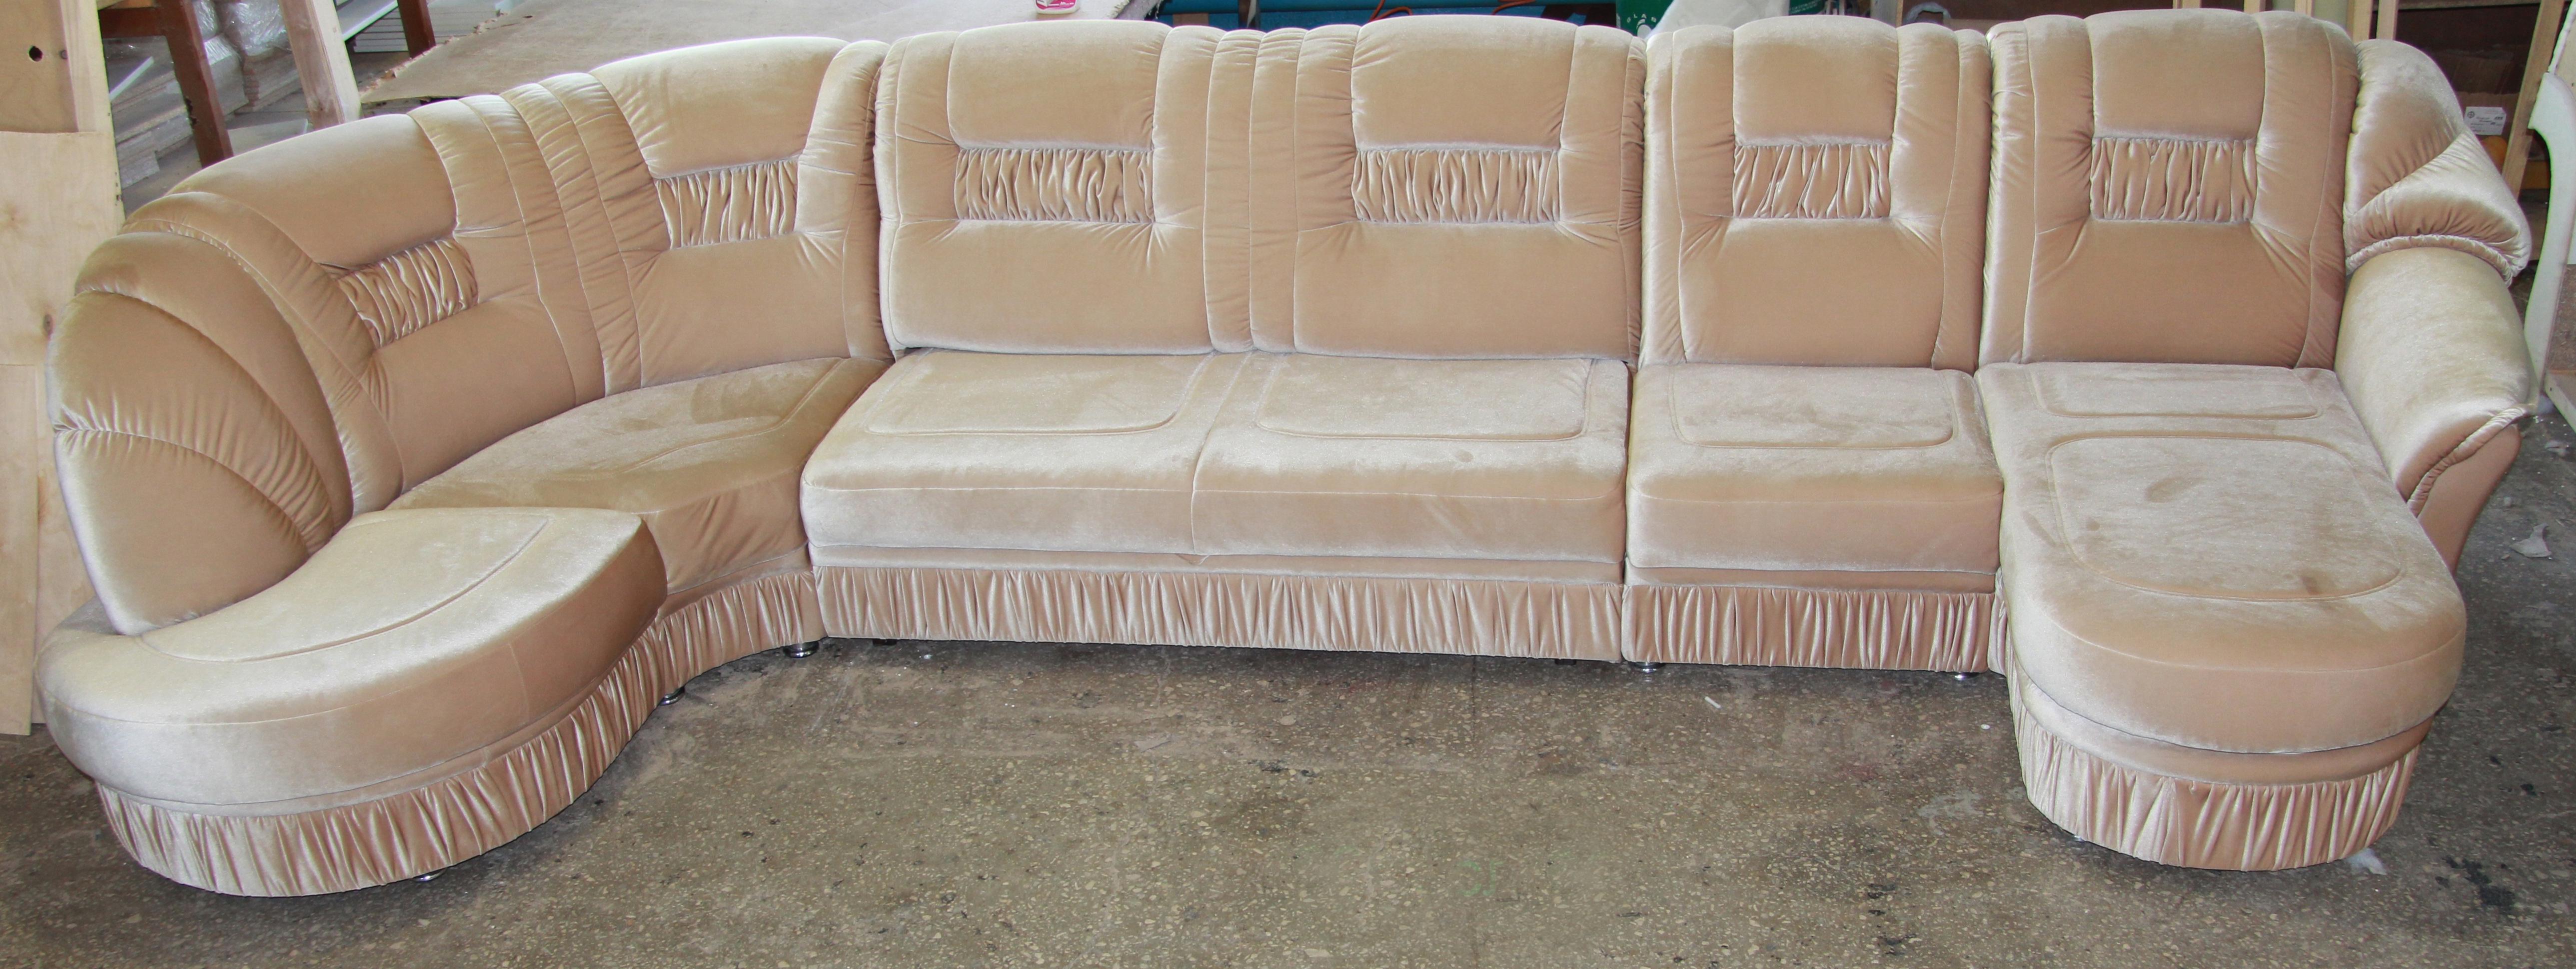 Перетяжка угловой диван после